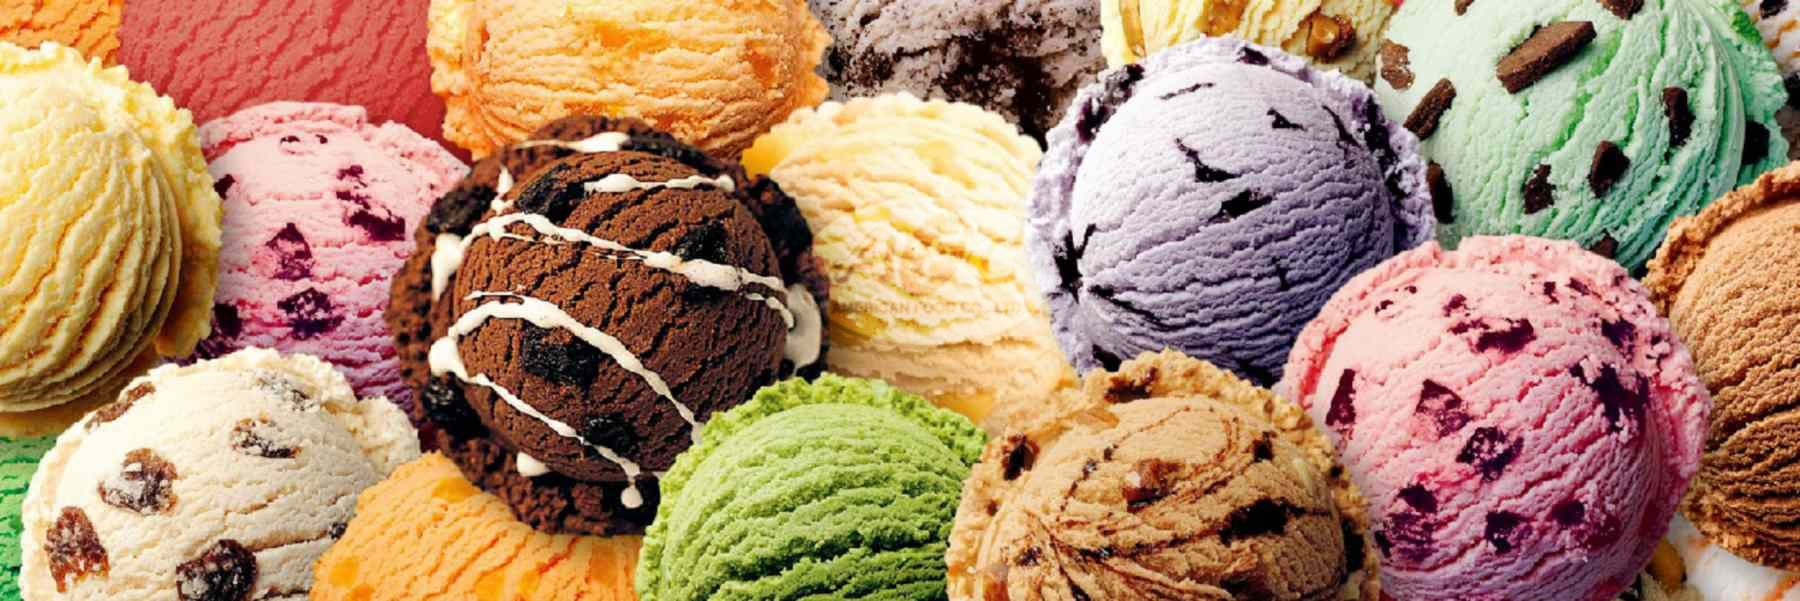 how-to-make-icecream-guide-gourmandesante